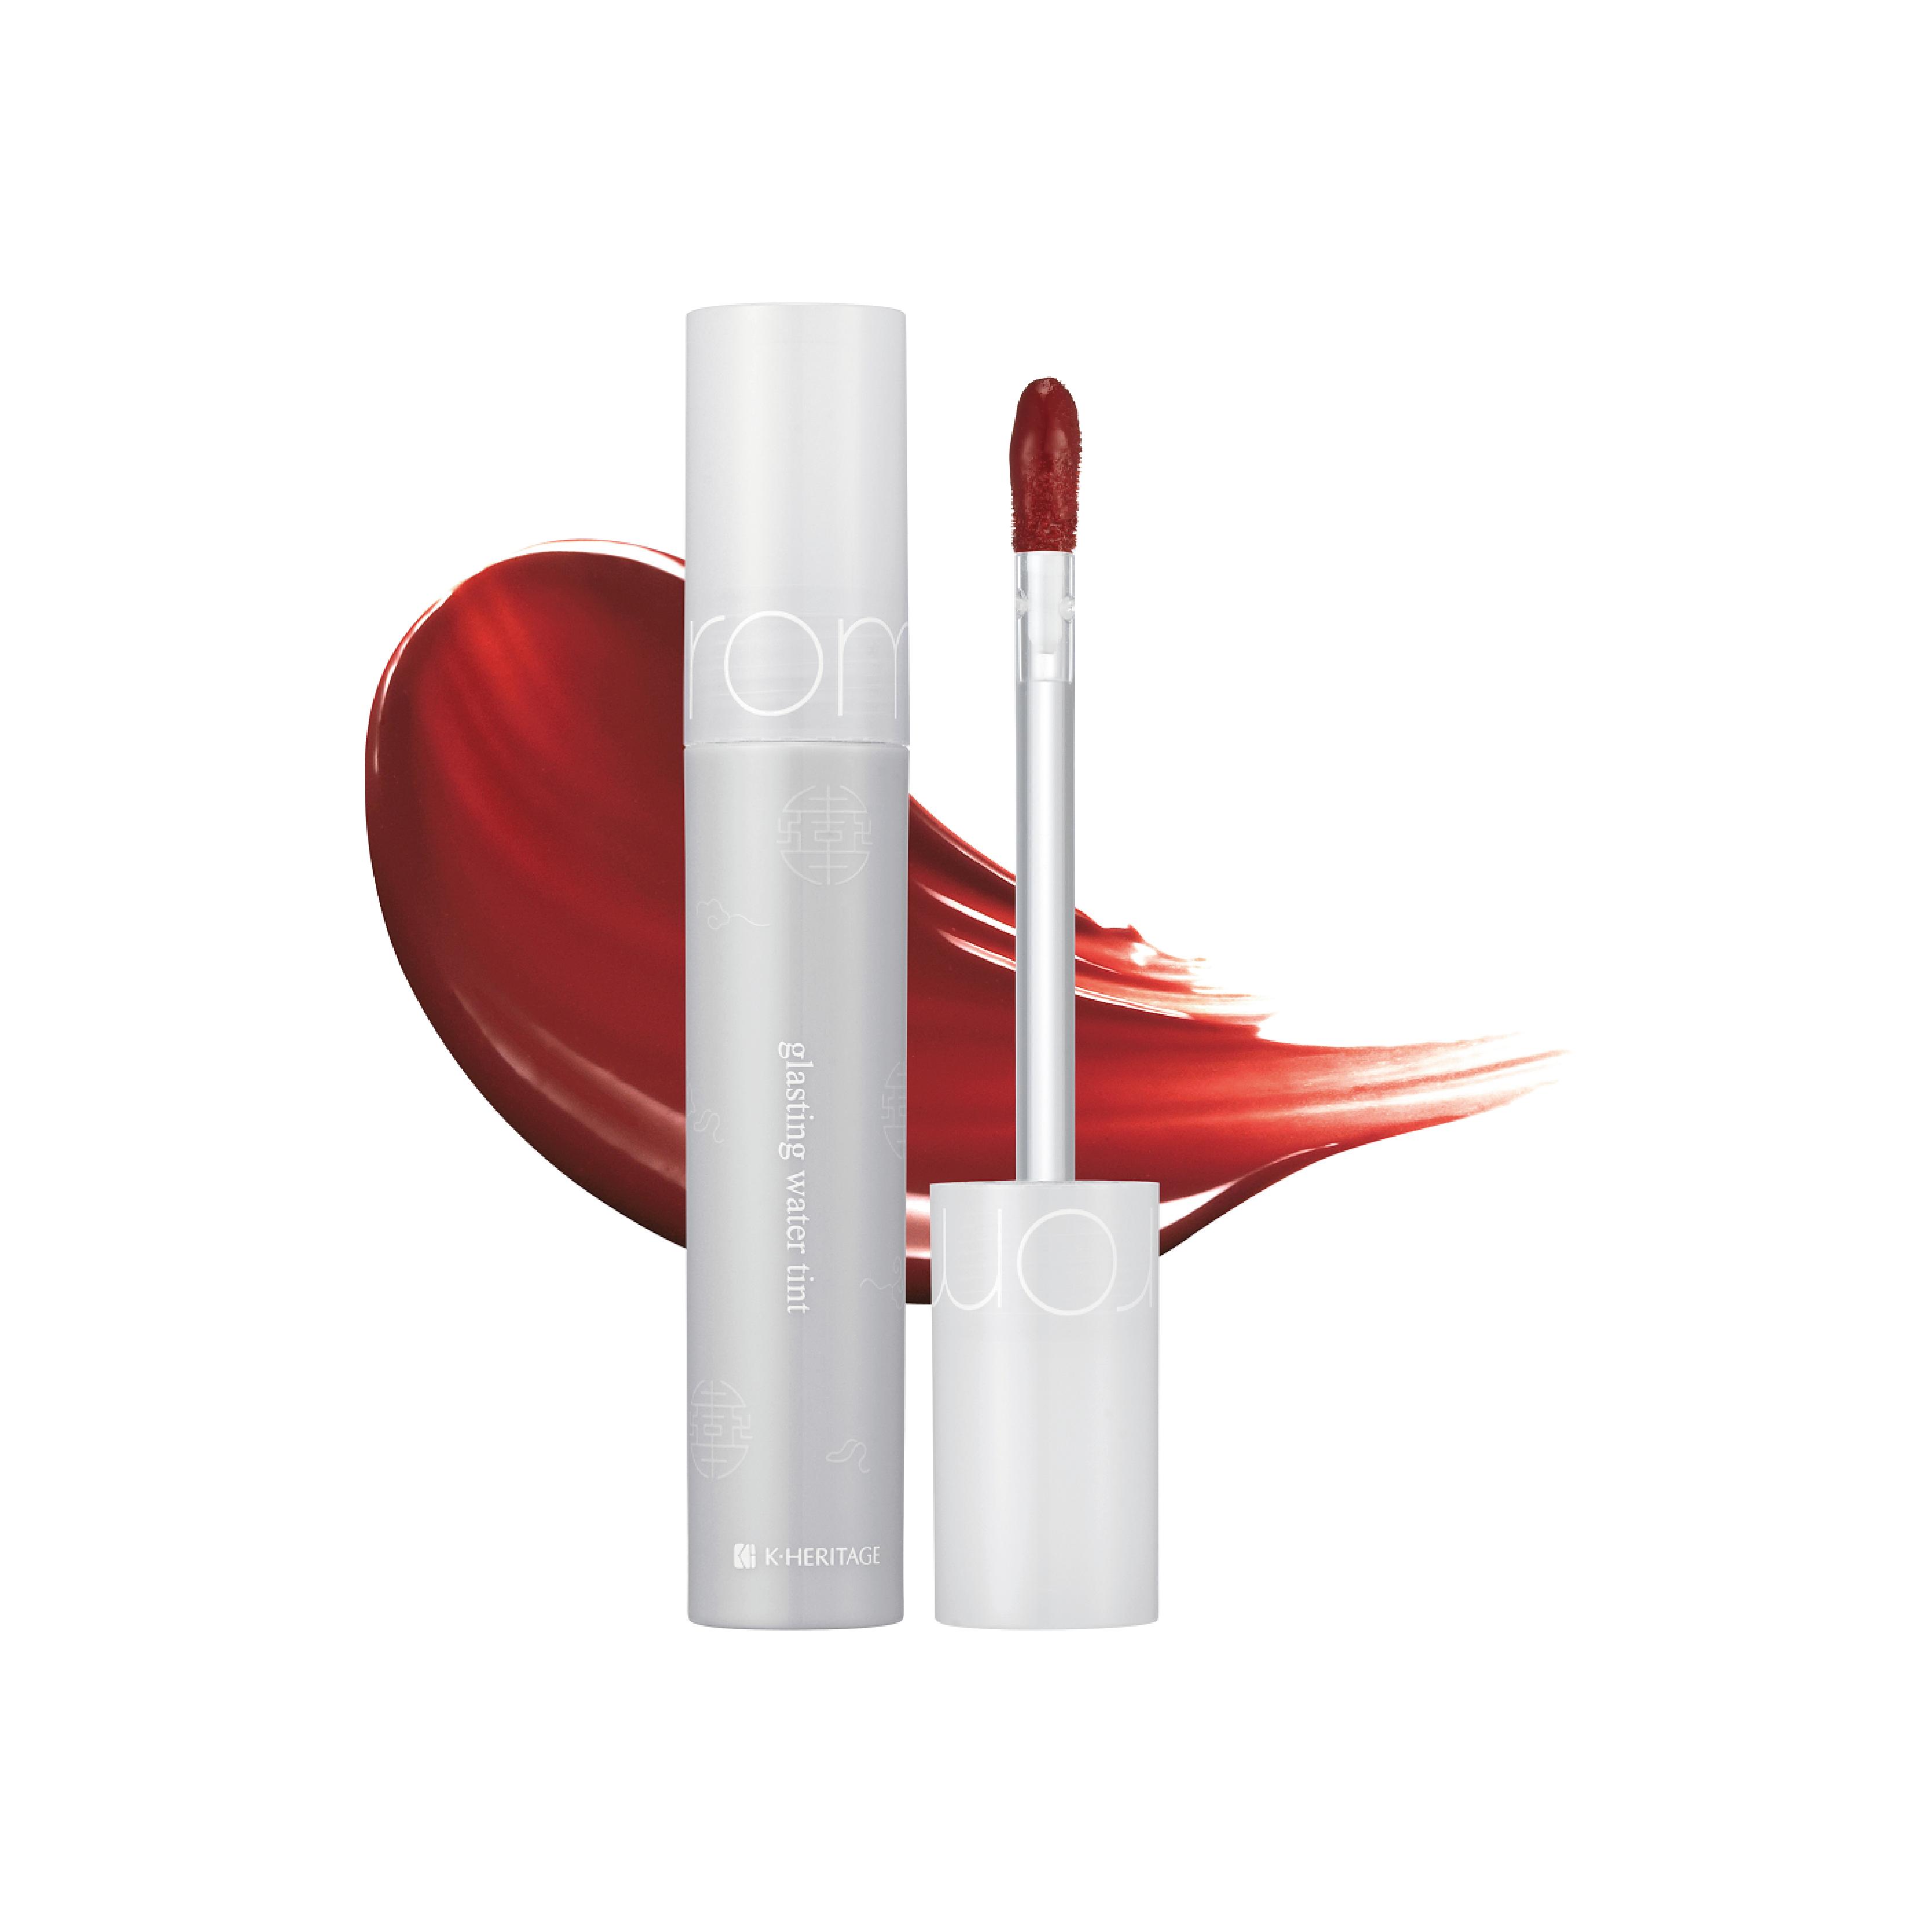 romand-lip-glasting-water-tint-omija-red-review